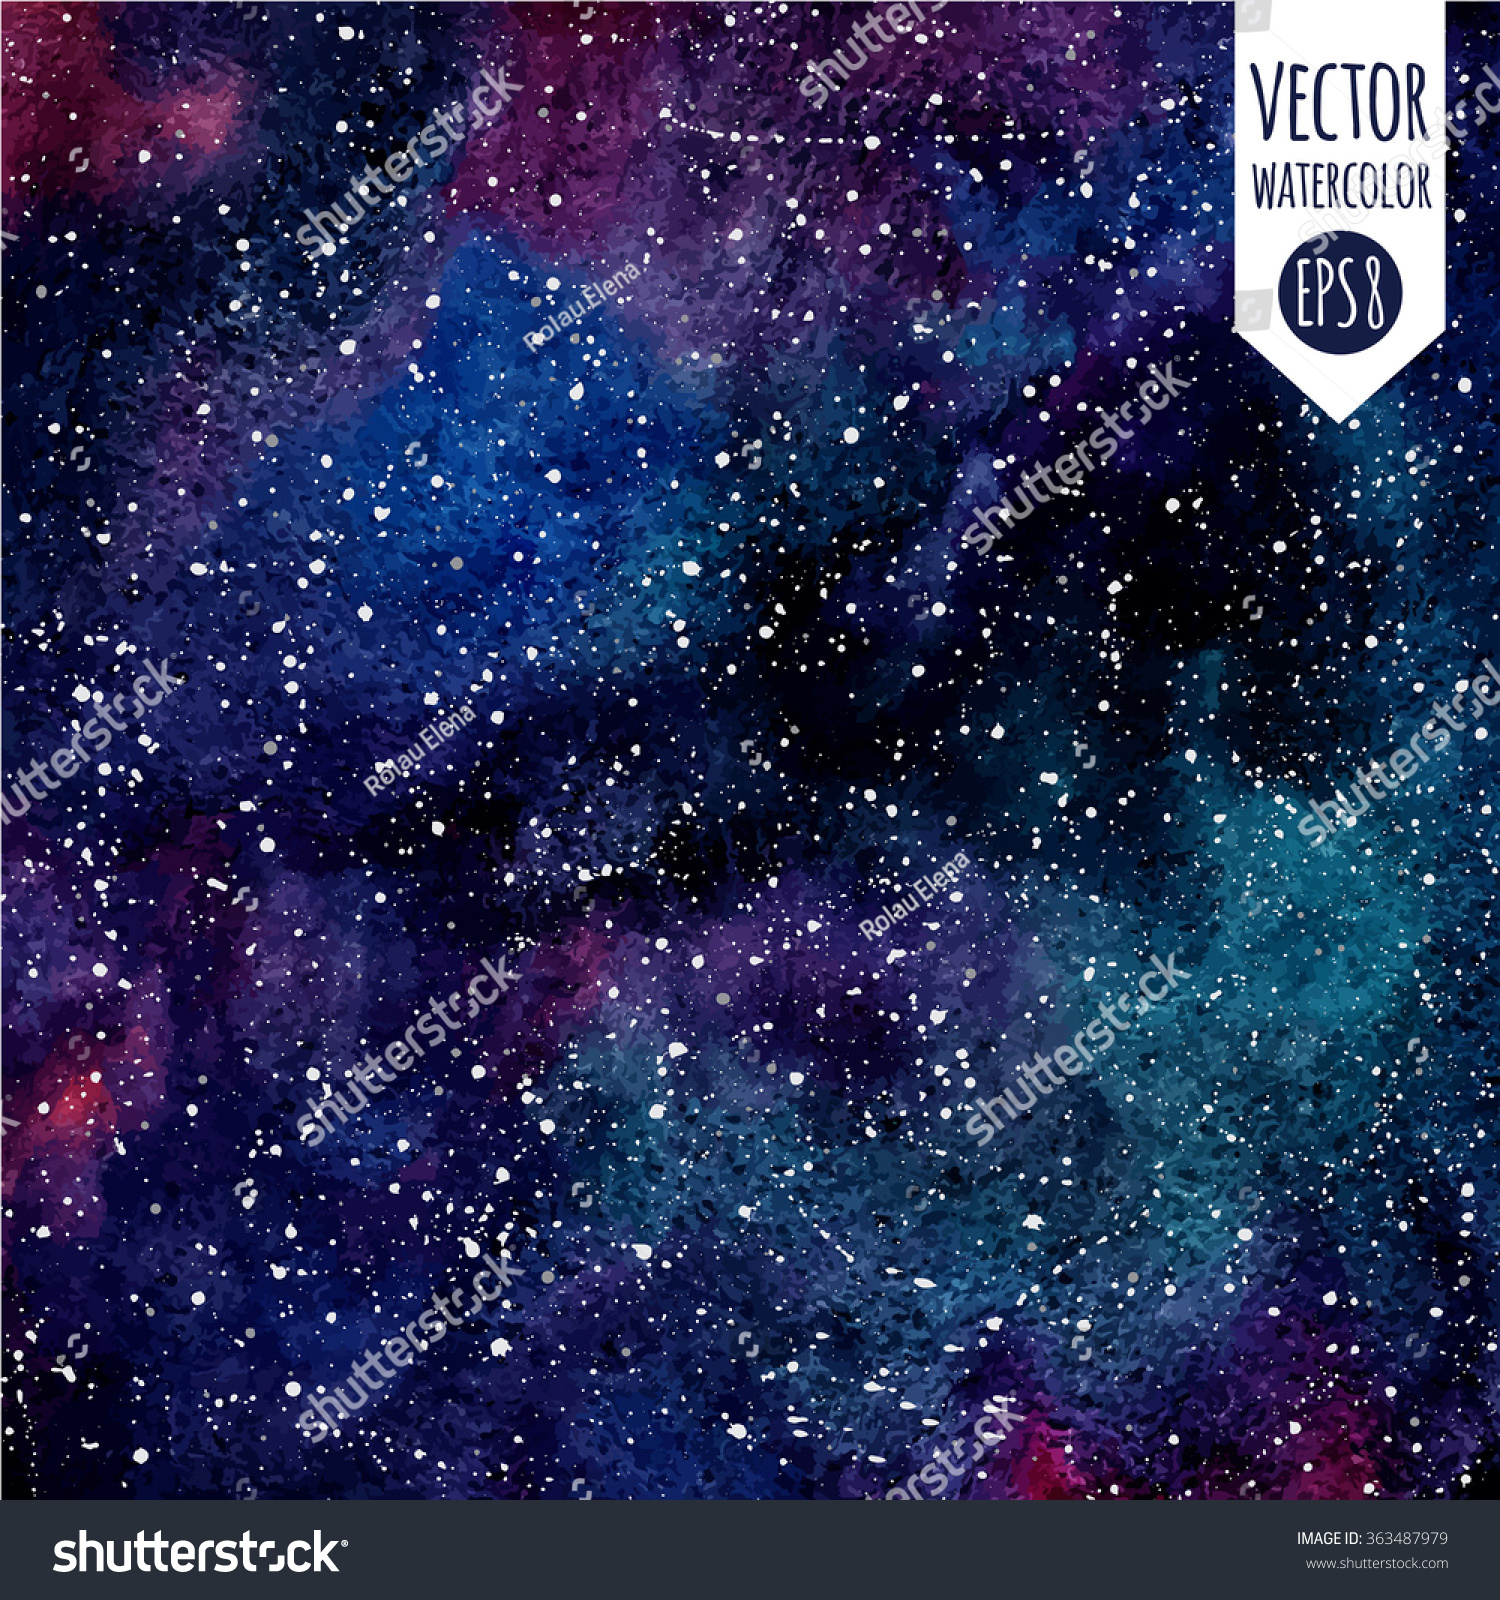 colorful stars background galaxy - photo #8